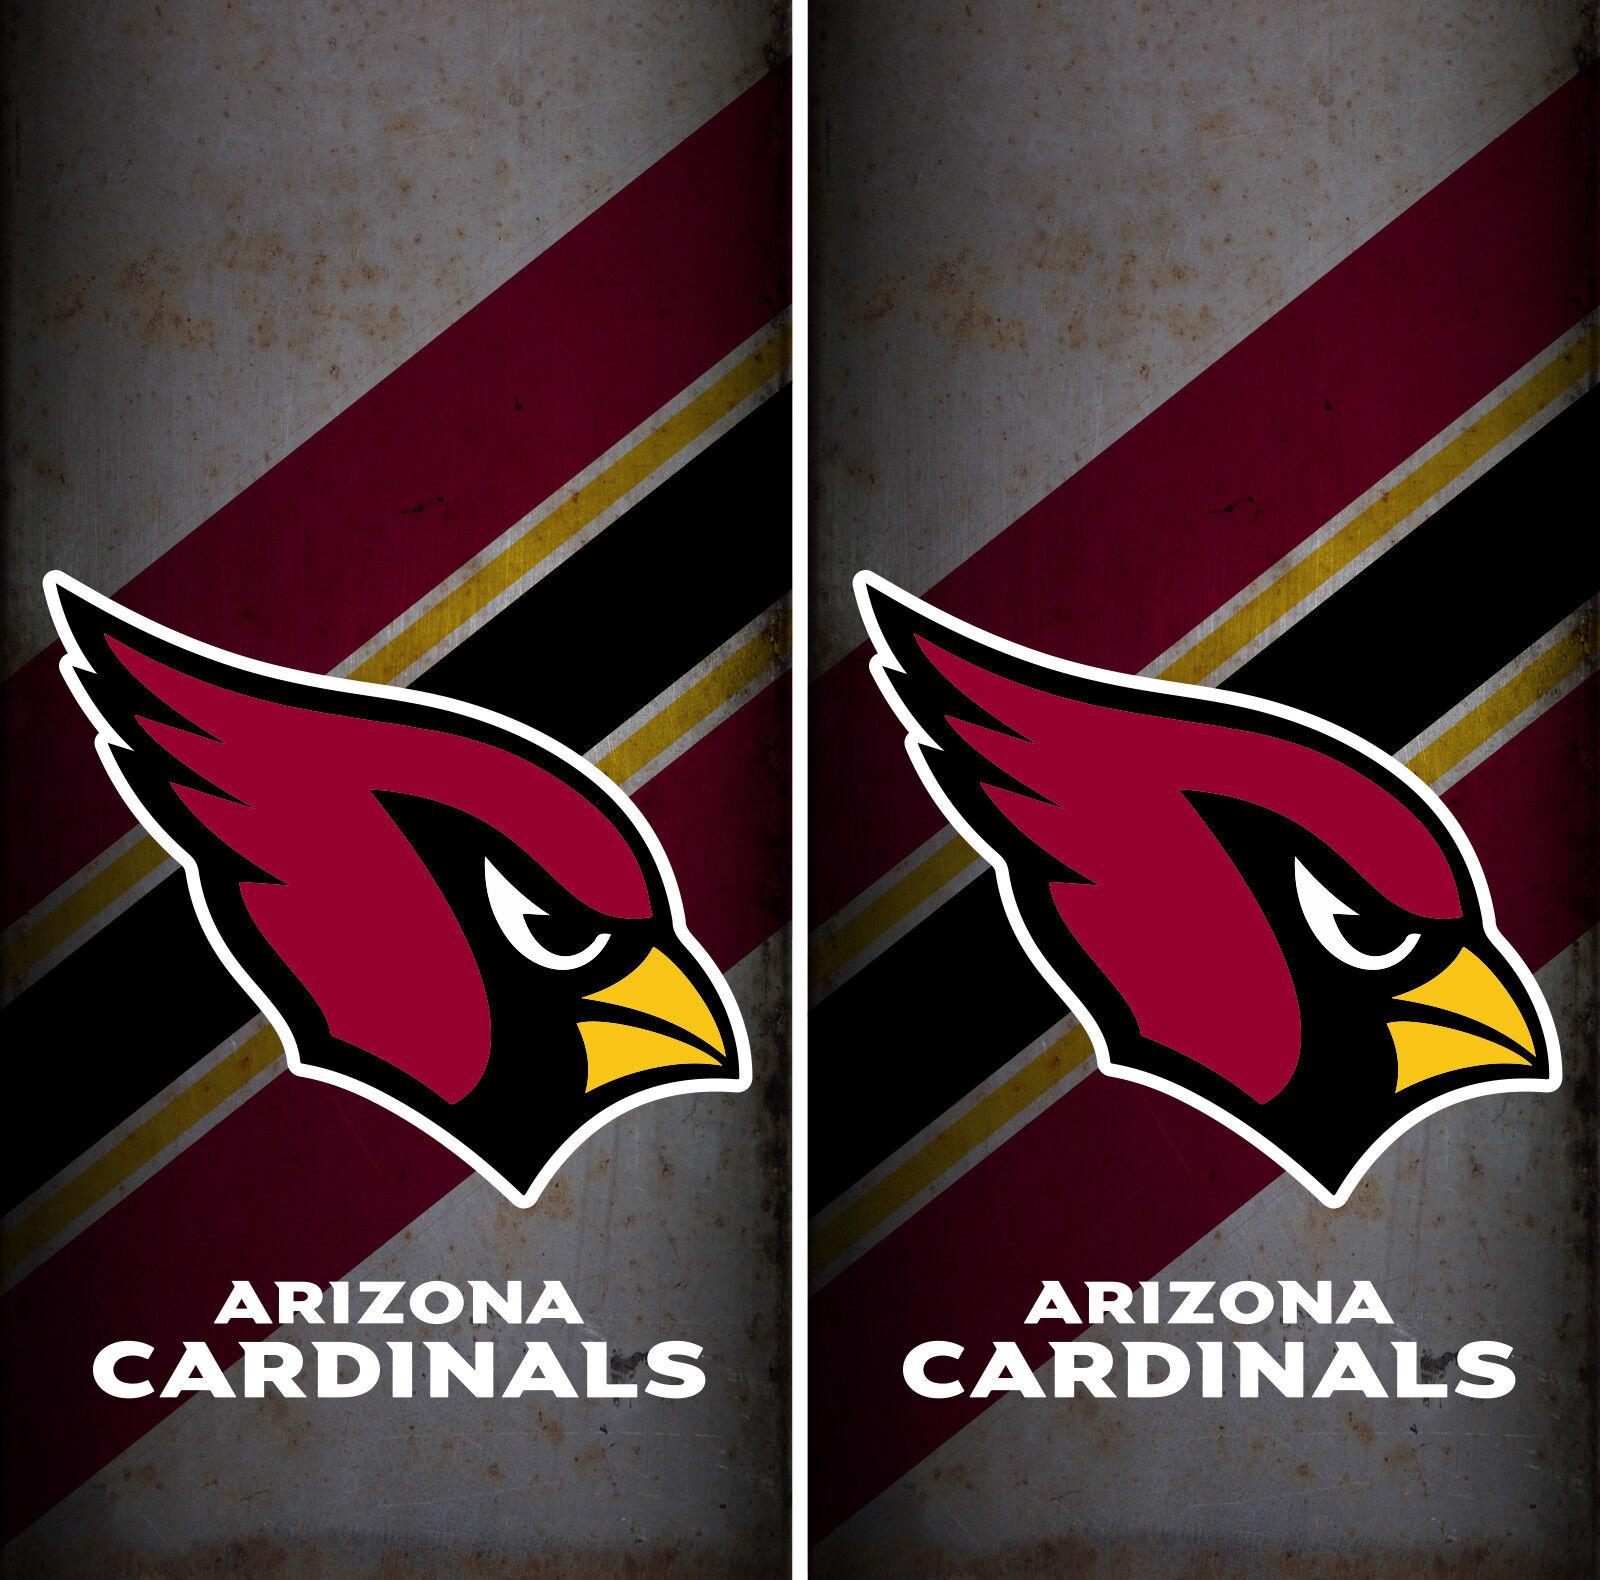 Arizona  Cardinals Team Cornhole Wrap NFL Skin Game Board Set Vinyl Decal CO05  hot sale online